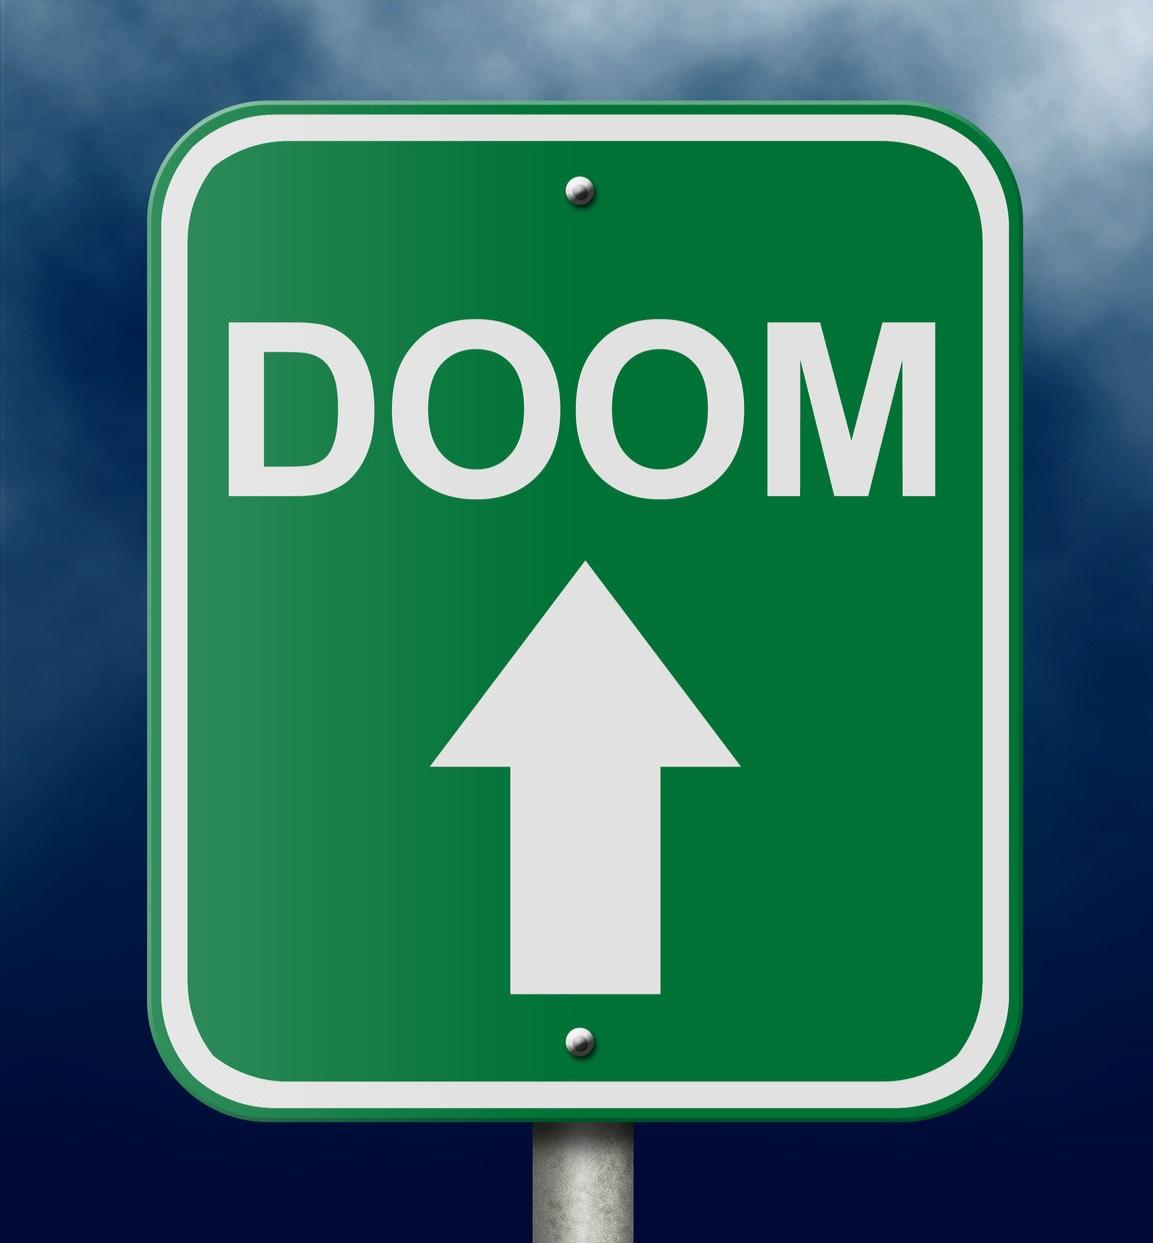 road sign says DOOM.jpg